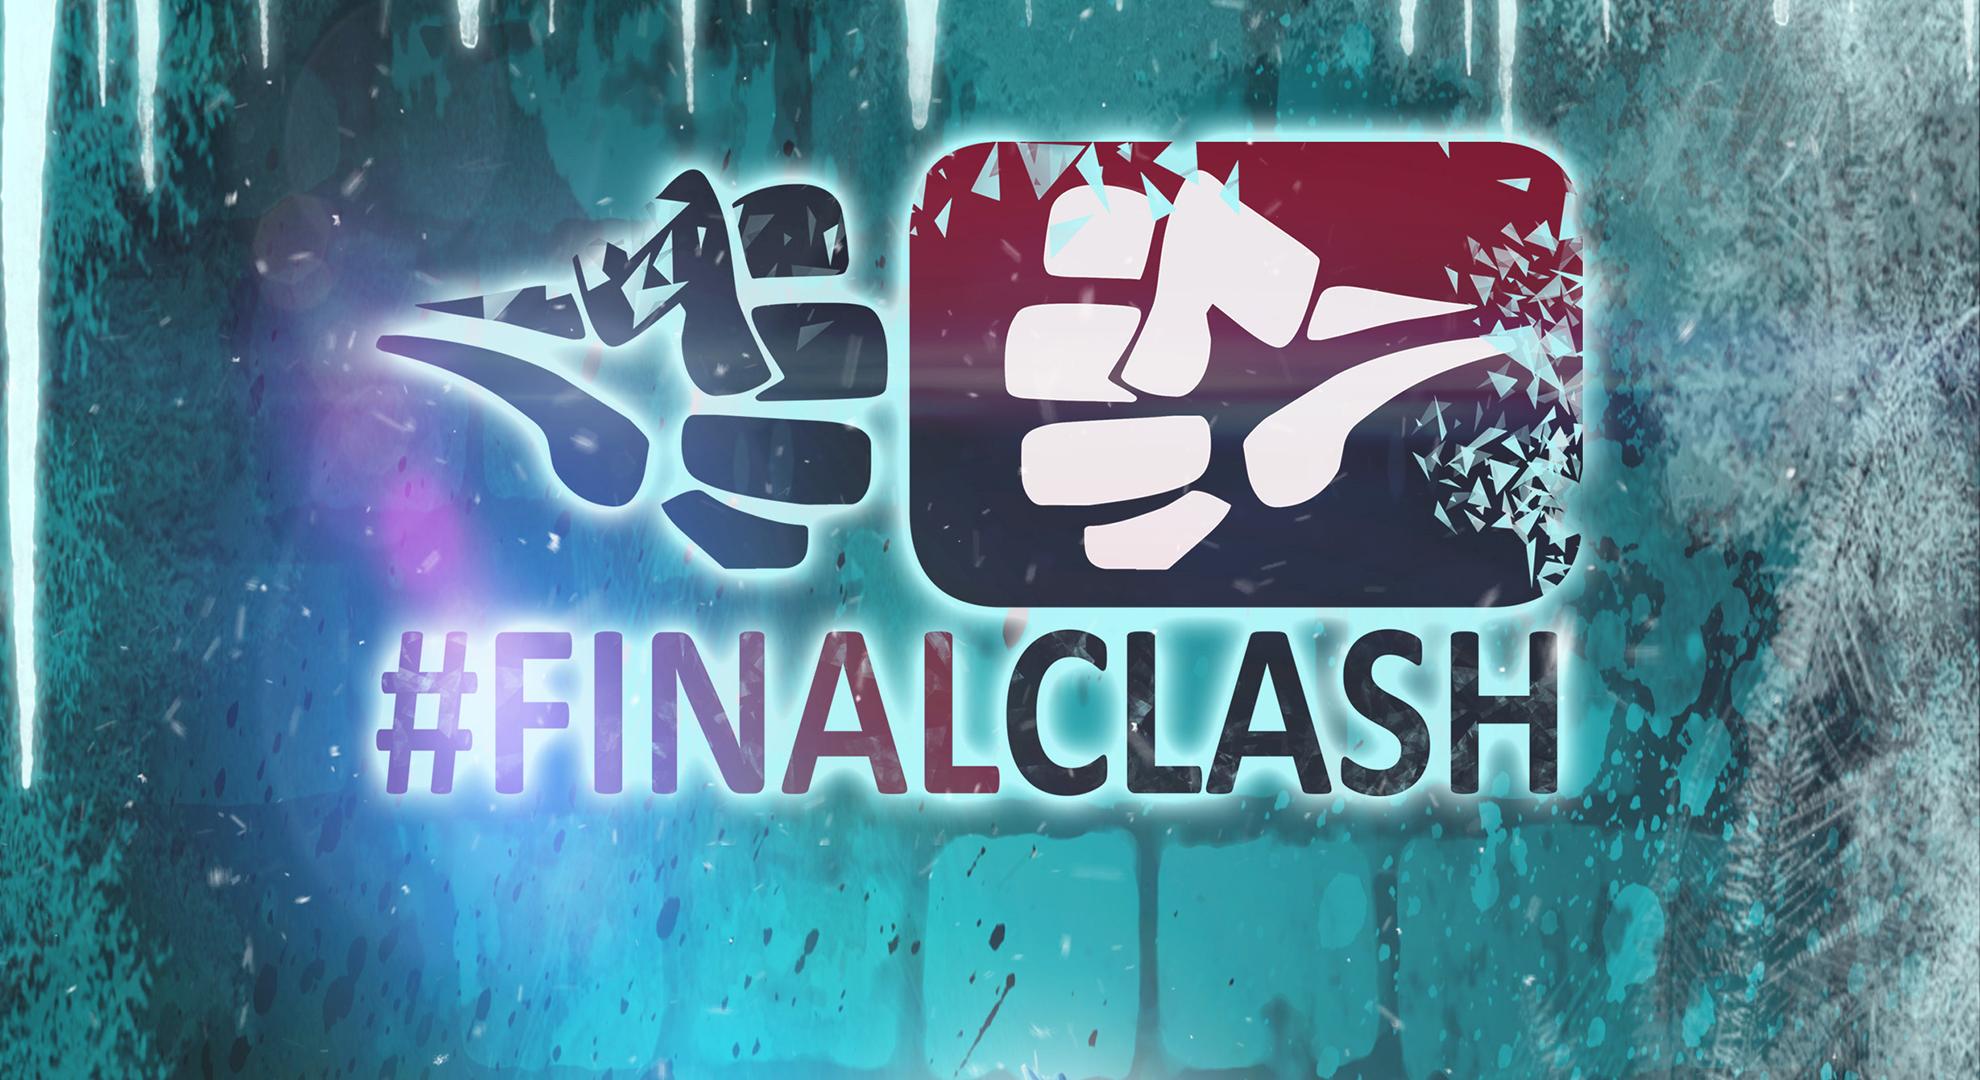 Final Clash_Darkvictory_funk